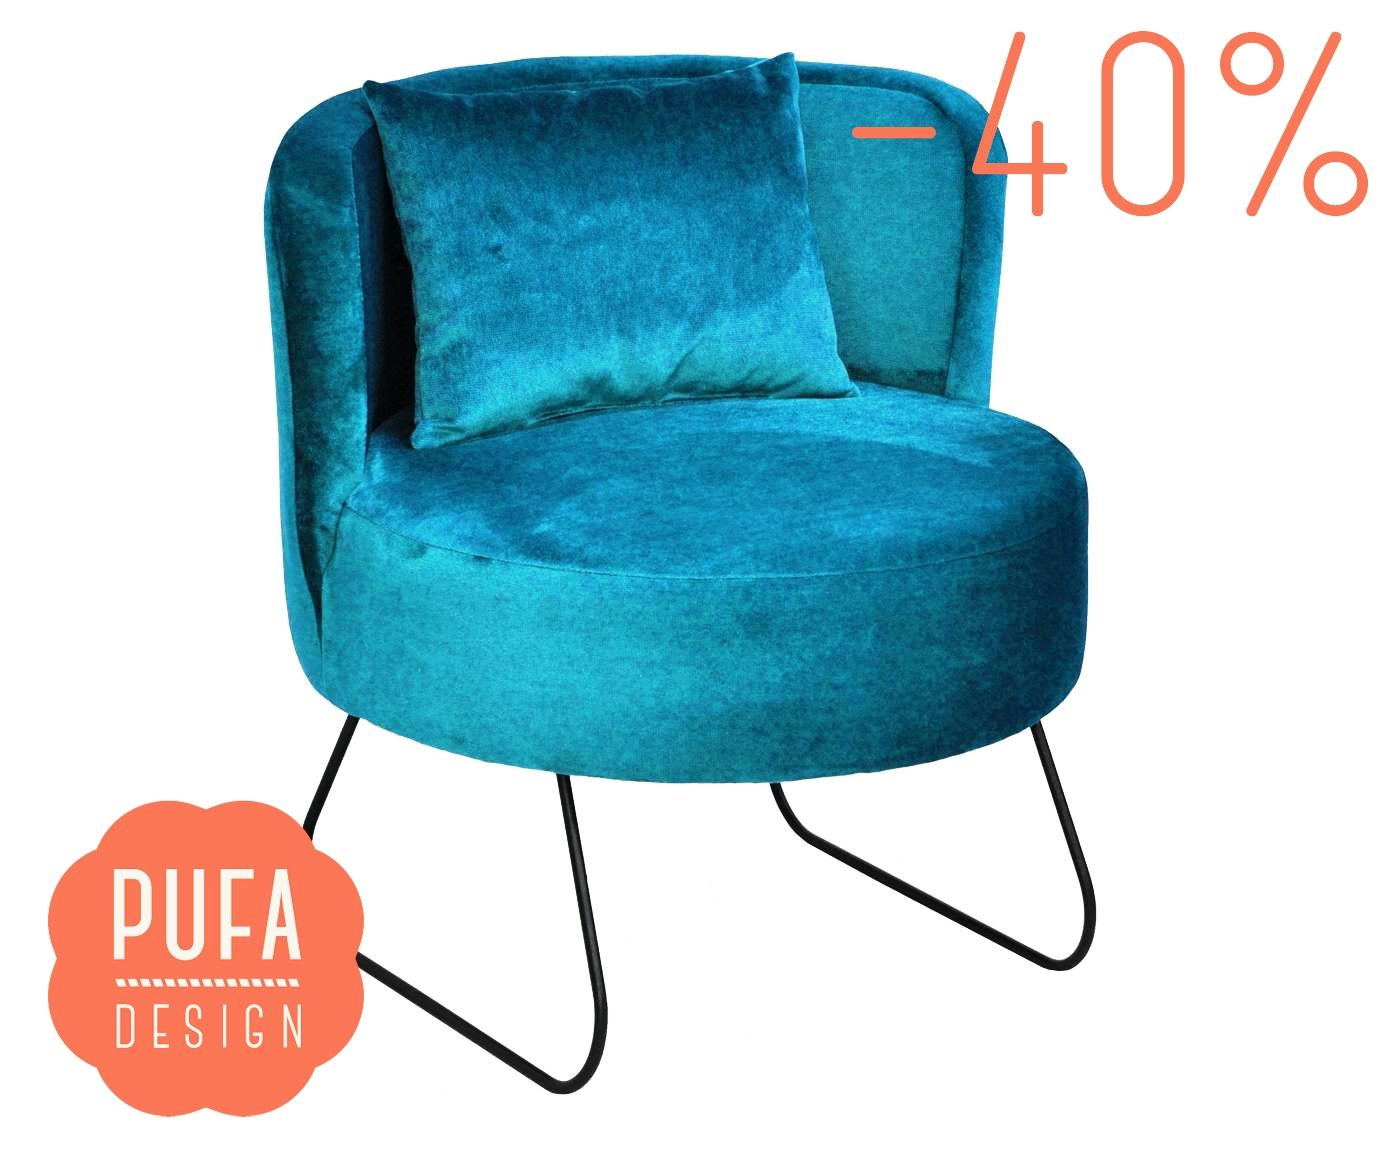 oferta_tygodnia_lever_pufa_design